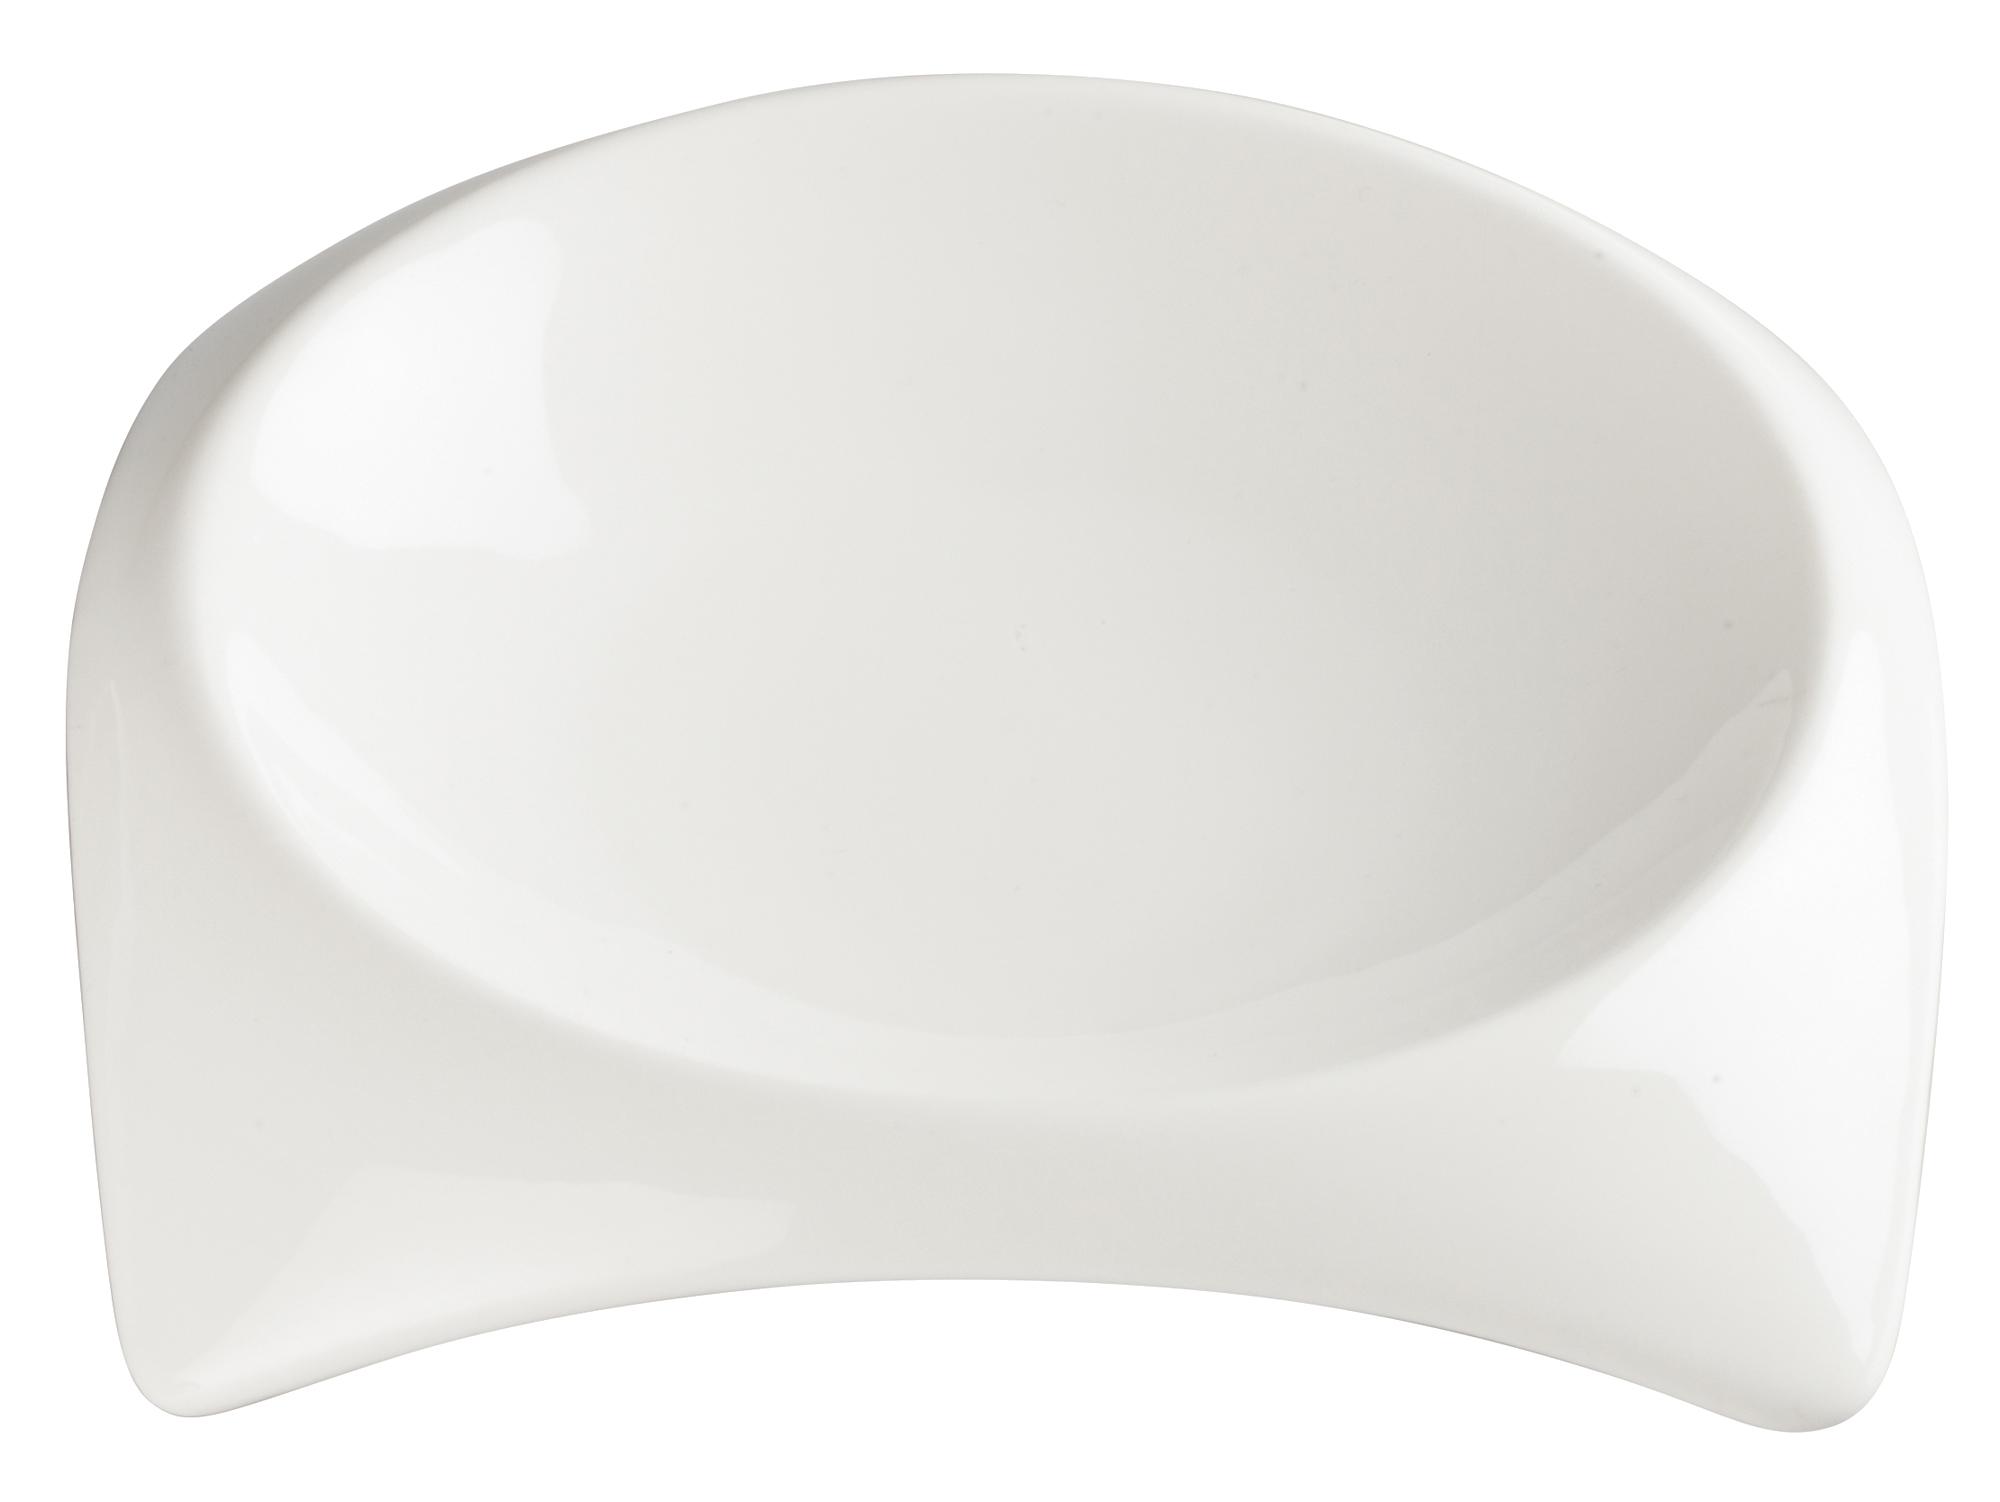 Winco WDP005-101 china, bowl,  0 - 8 oz